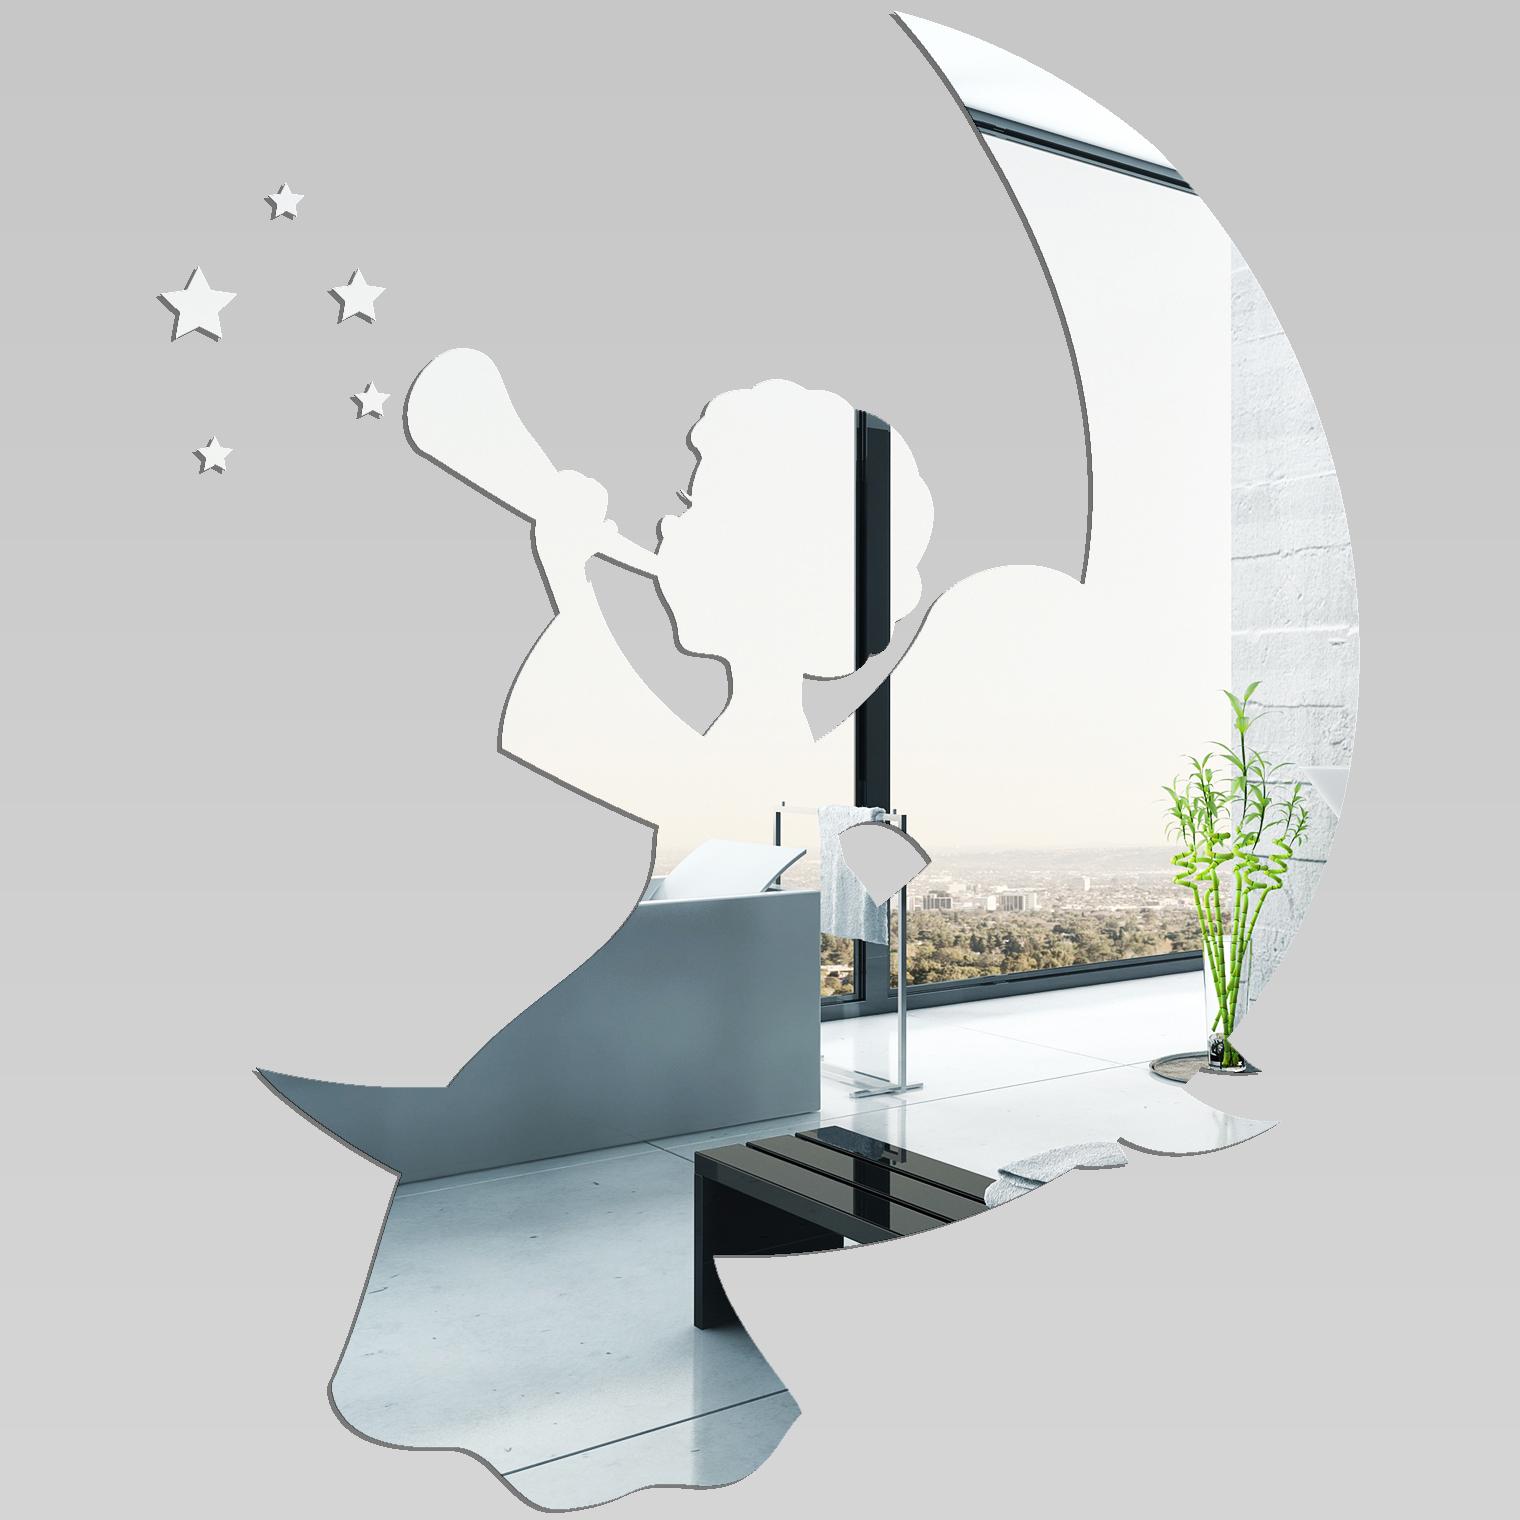 espejos decorativo acrlico plxiglas ngel